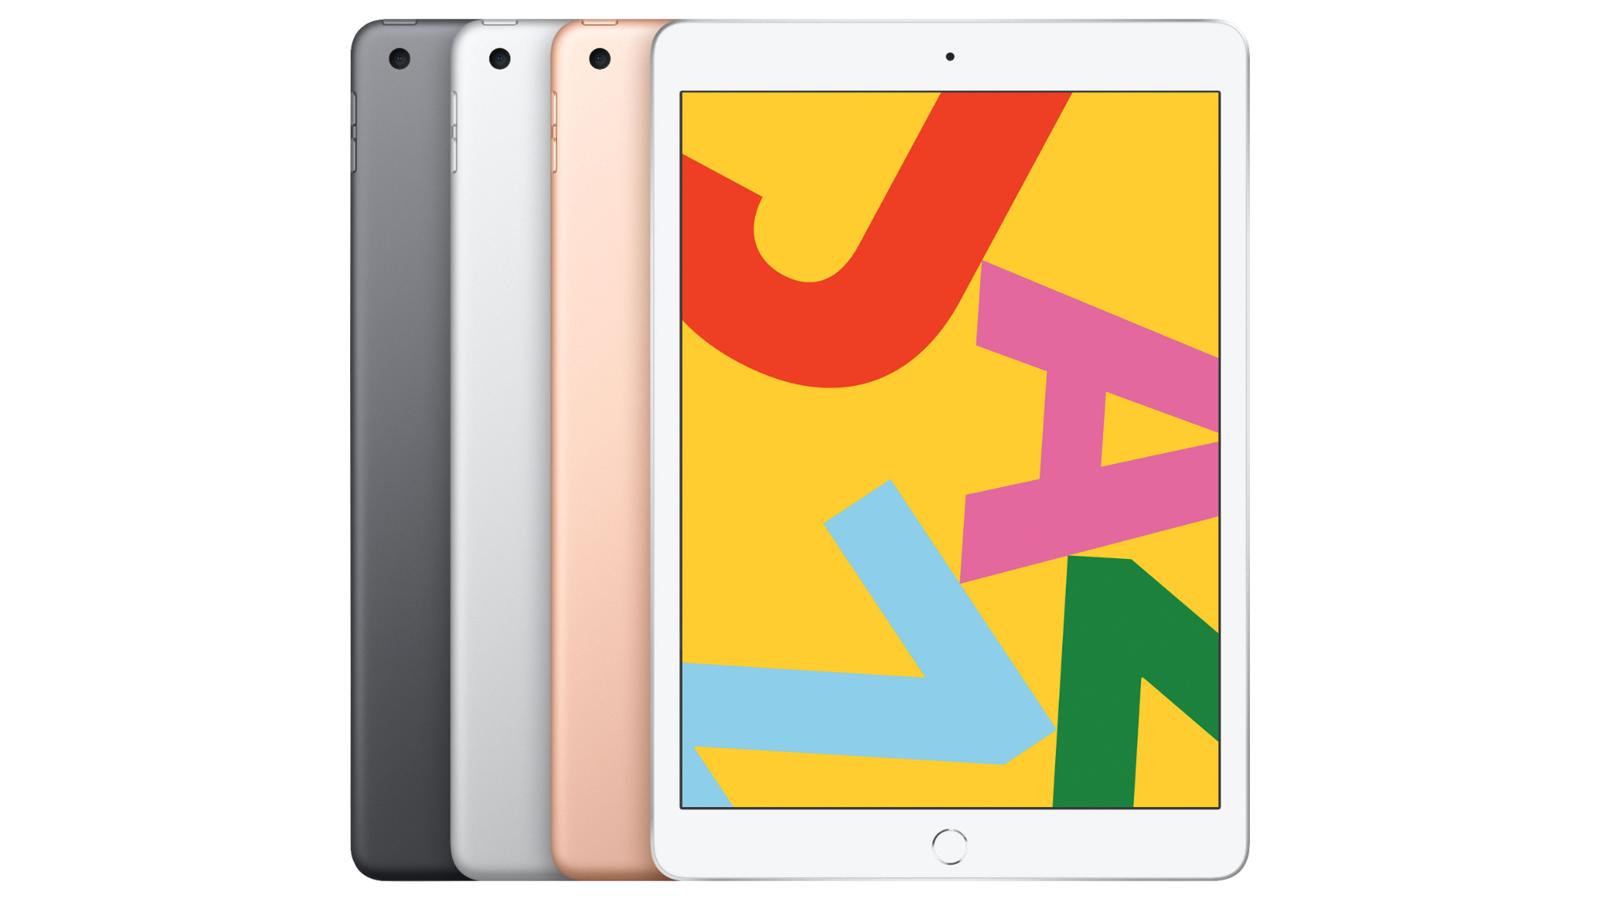 Latest 2019 iPad with Wi-Fi and 32 GB of storage